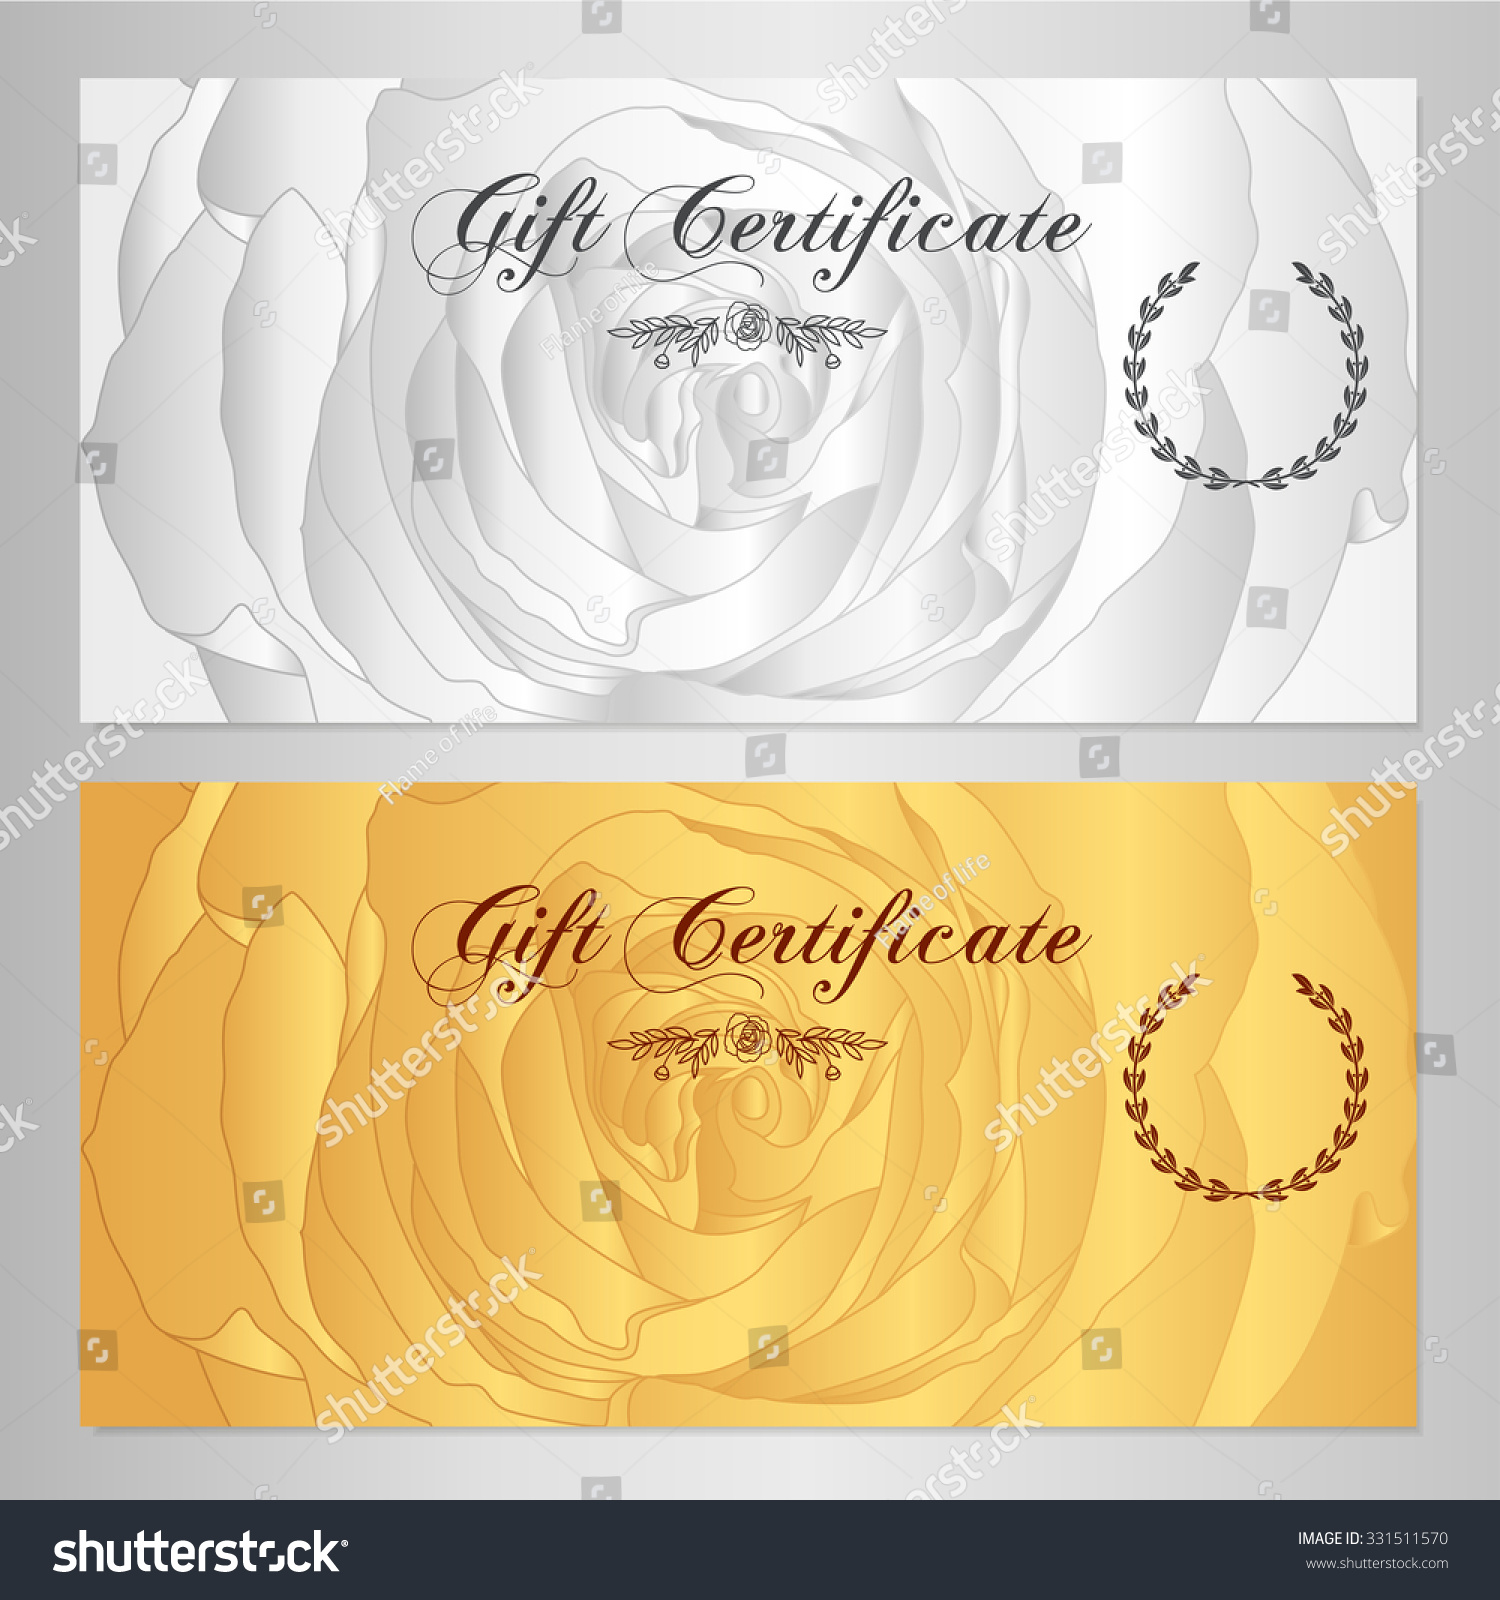 Manicure Gift Certificate Template